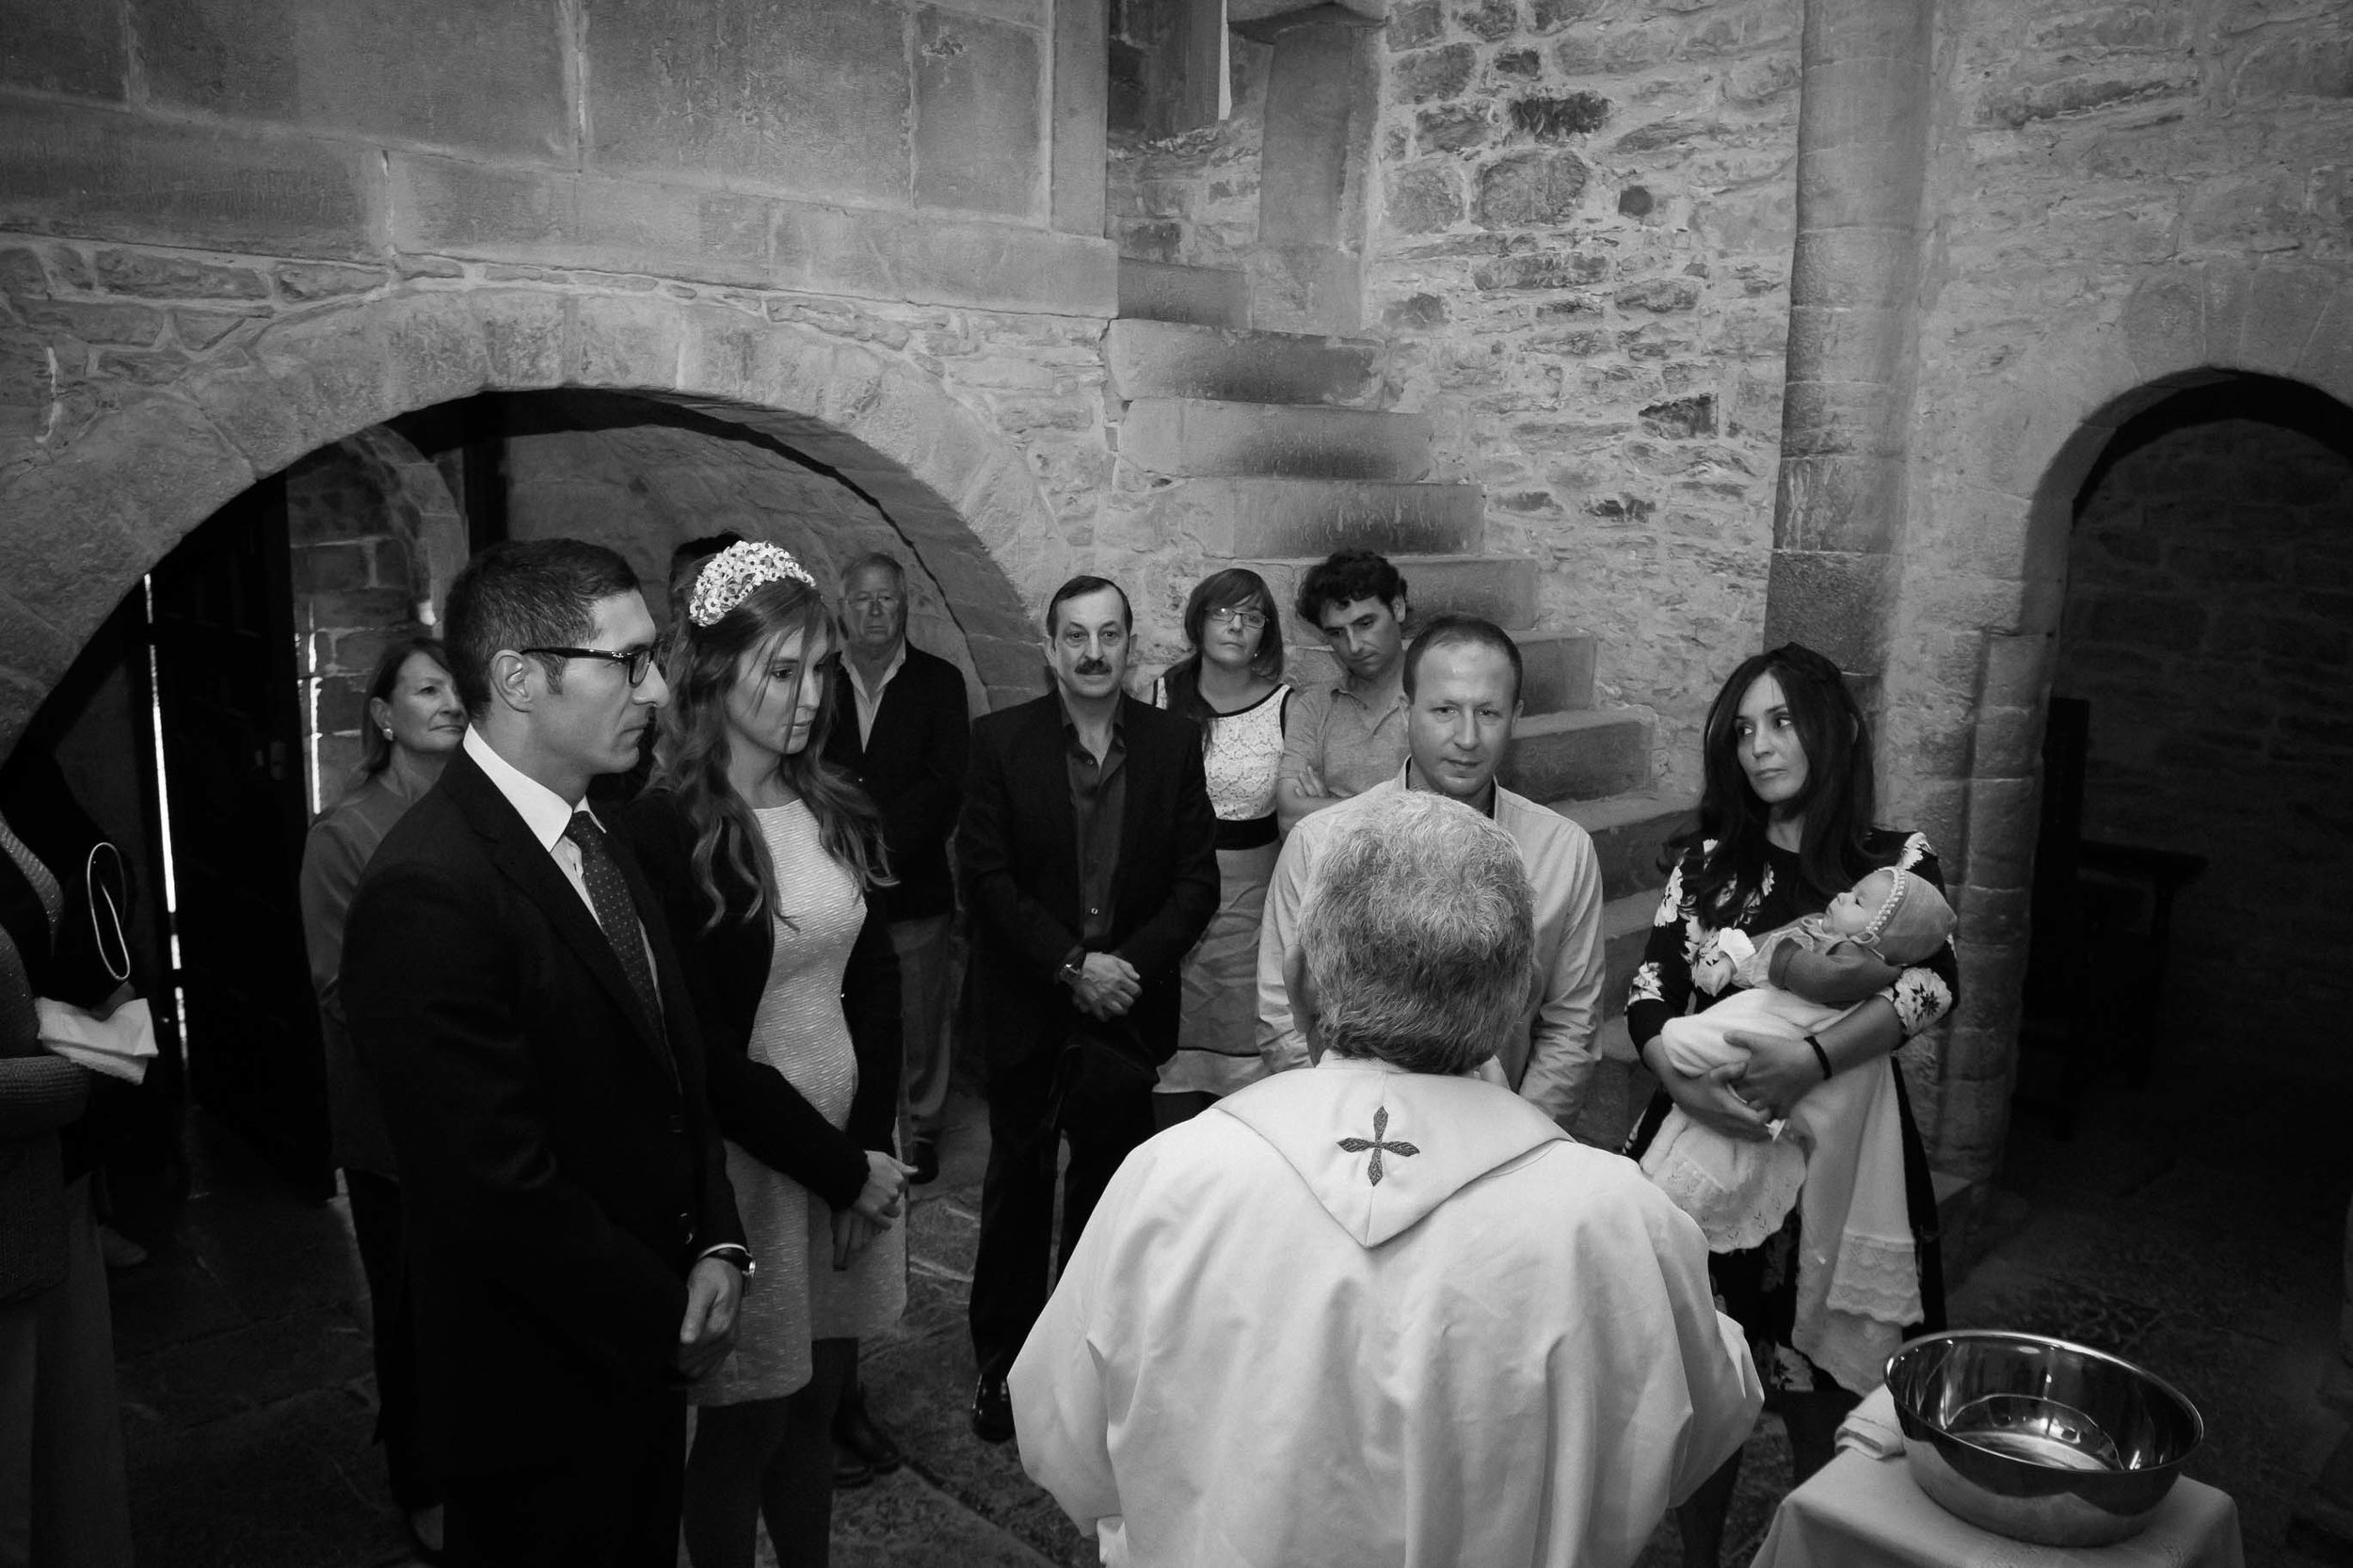 bautizo en pola de lena asturias fotografo bebes-11.JPG